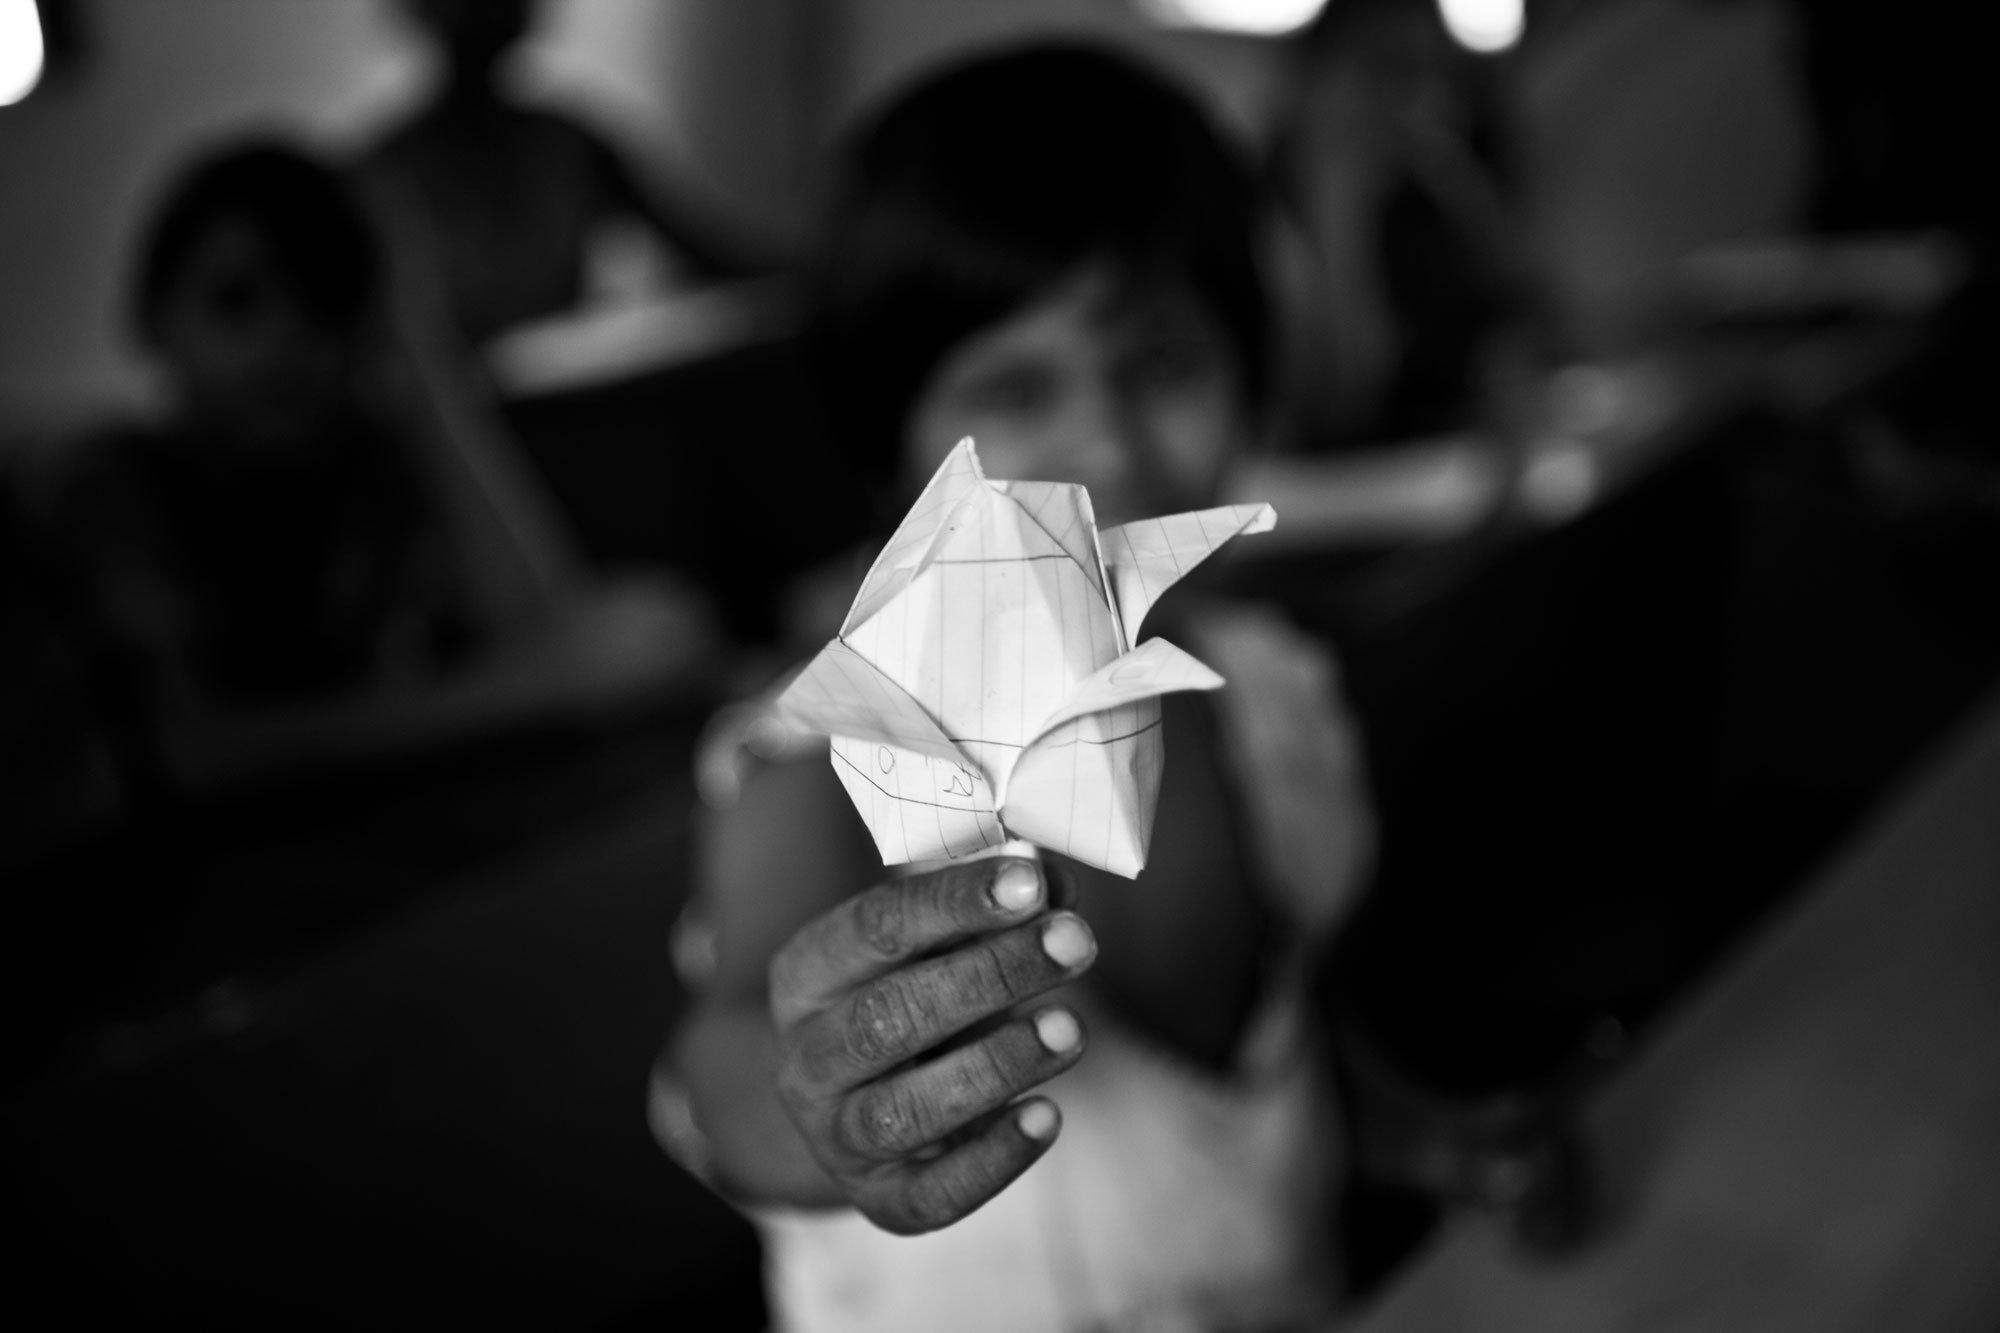 A child offering a paper flower_human trafficking_uma sanjog